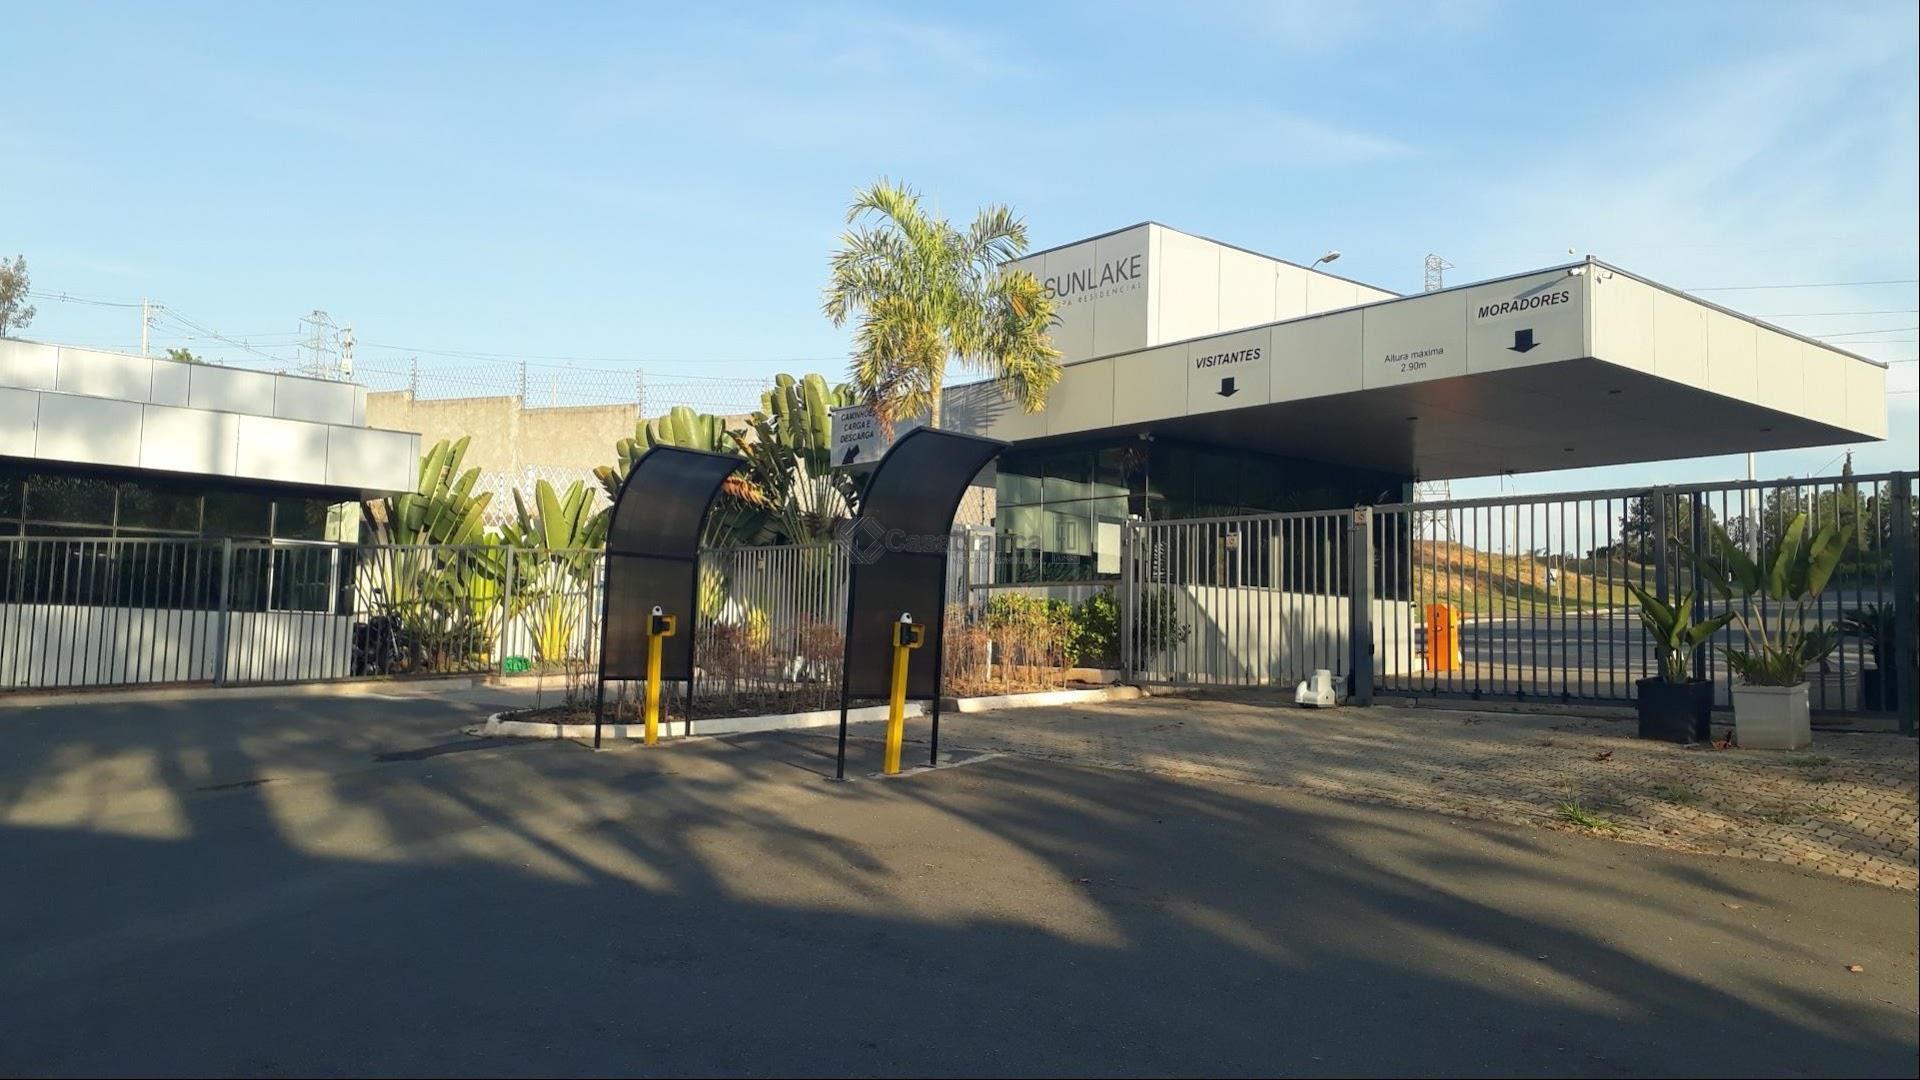 Terreno residencial à venda, Condomínio Sunlake Residencial, Votorantim - TE4588.